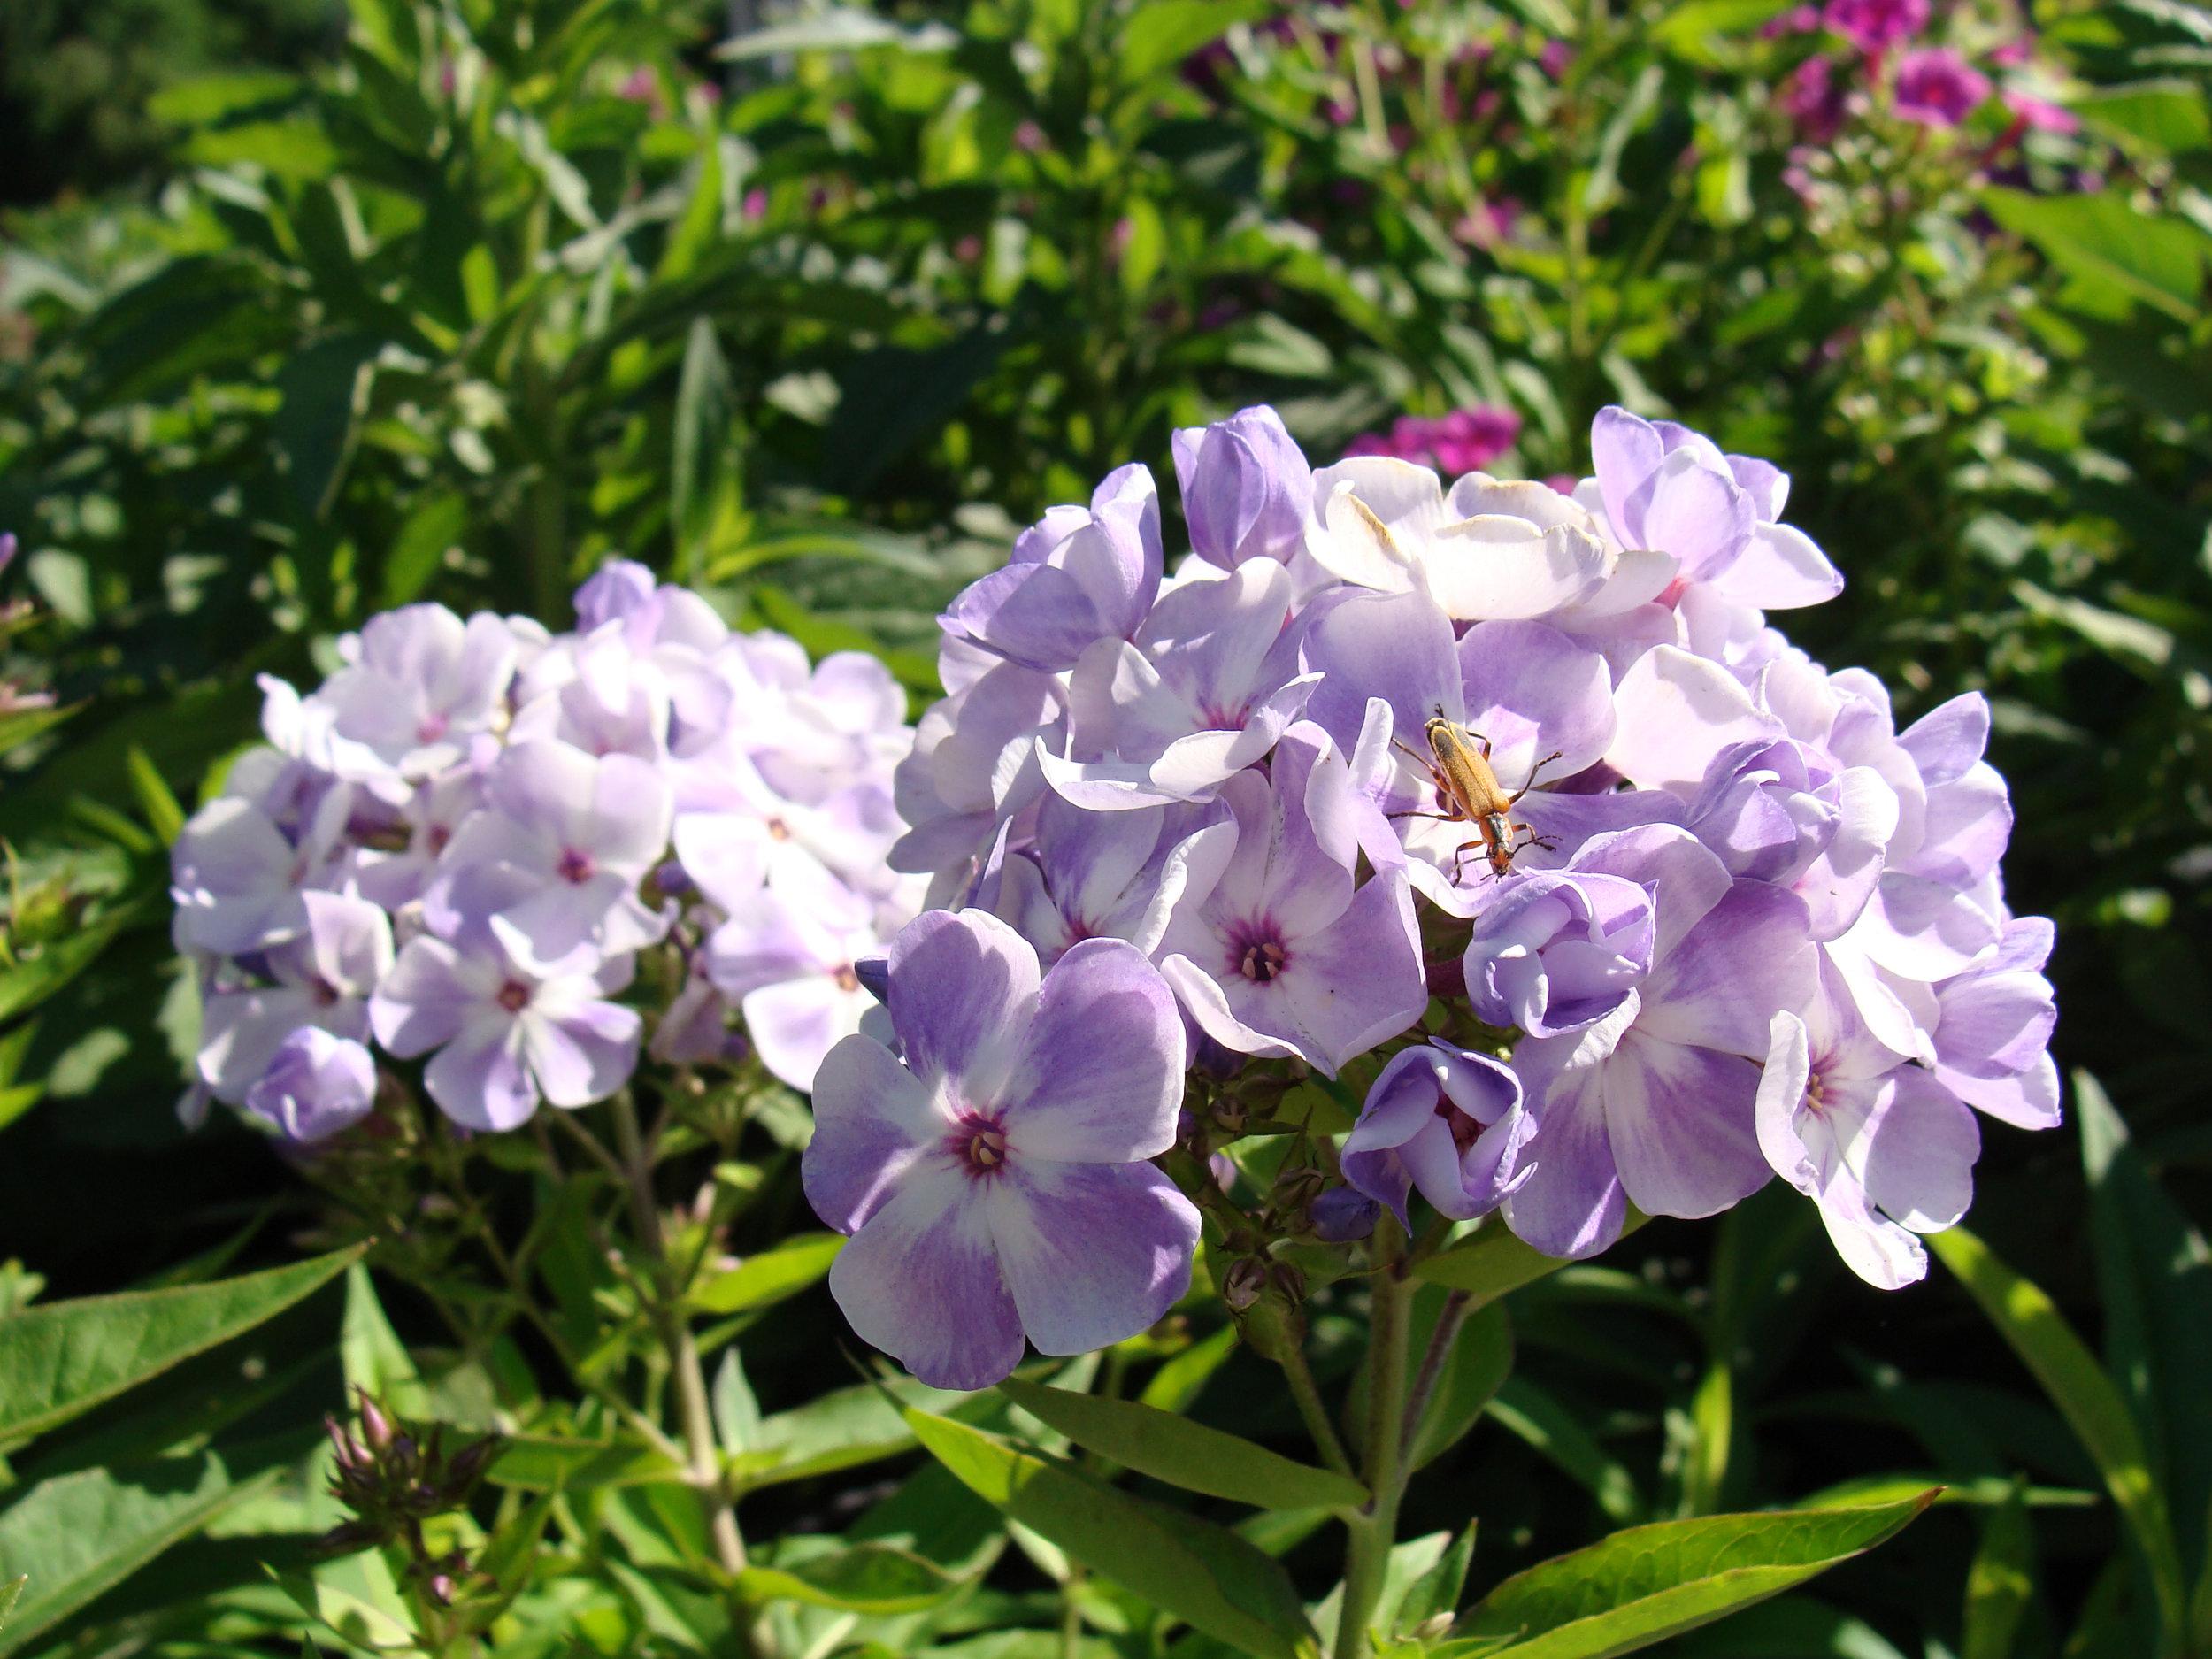 Phlox_Garden_Pur_Wht_6-18.jpg